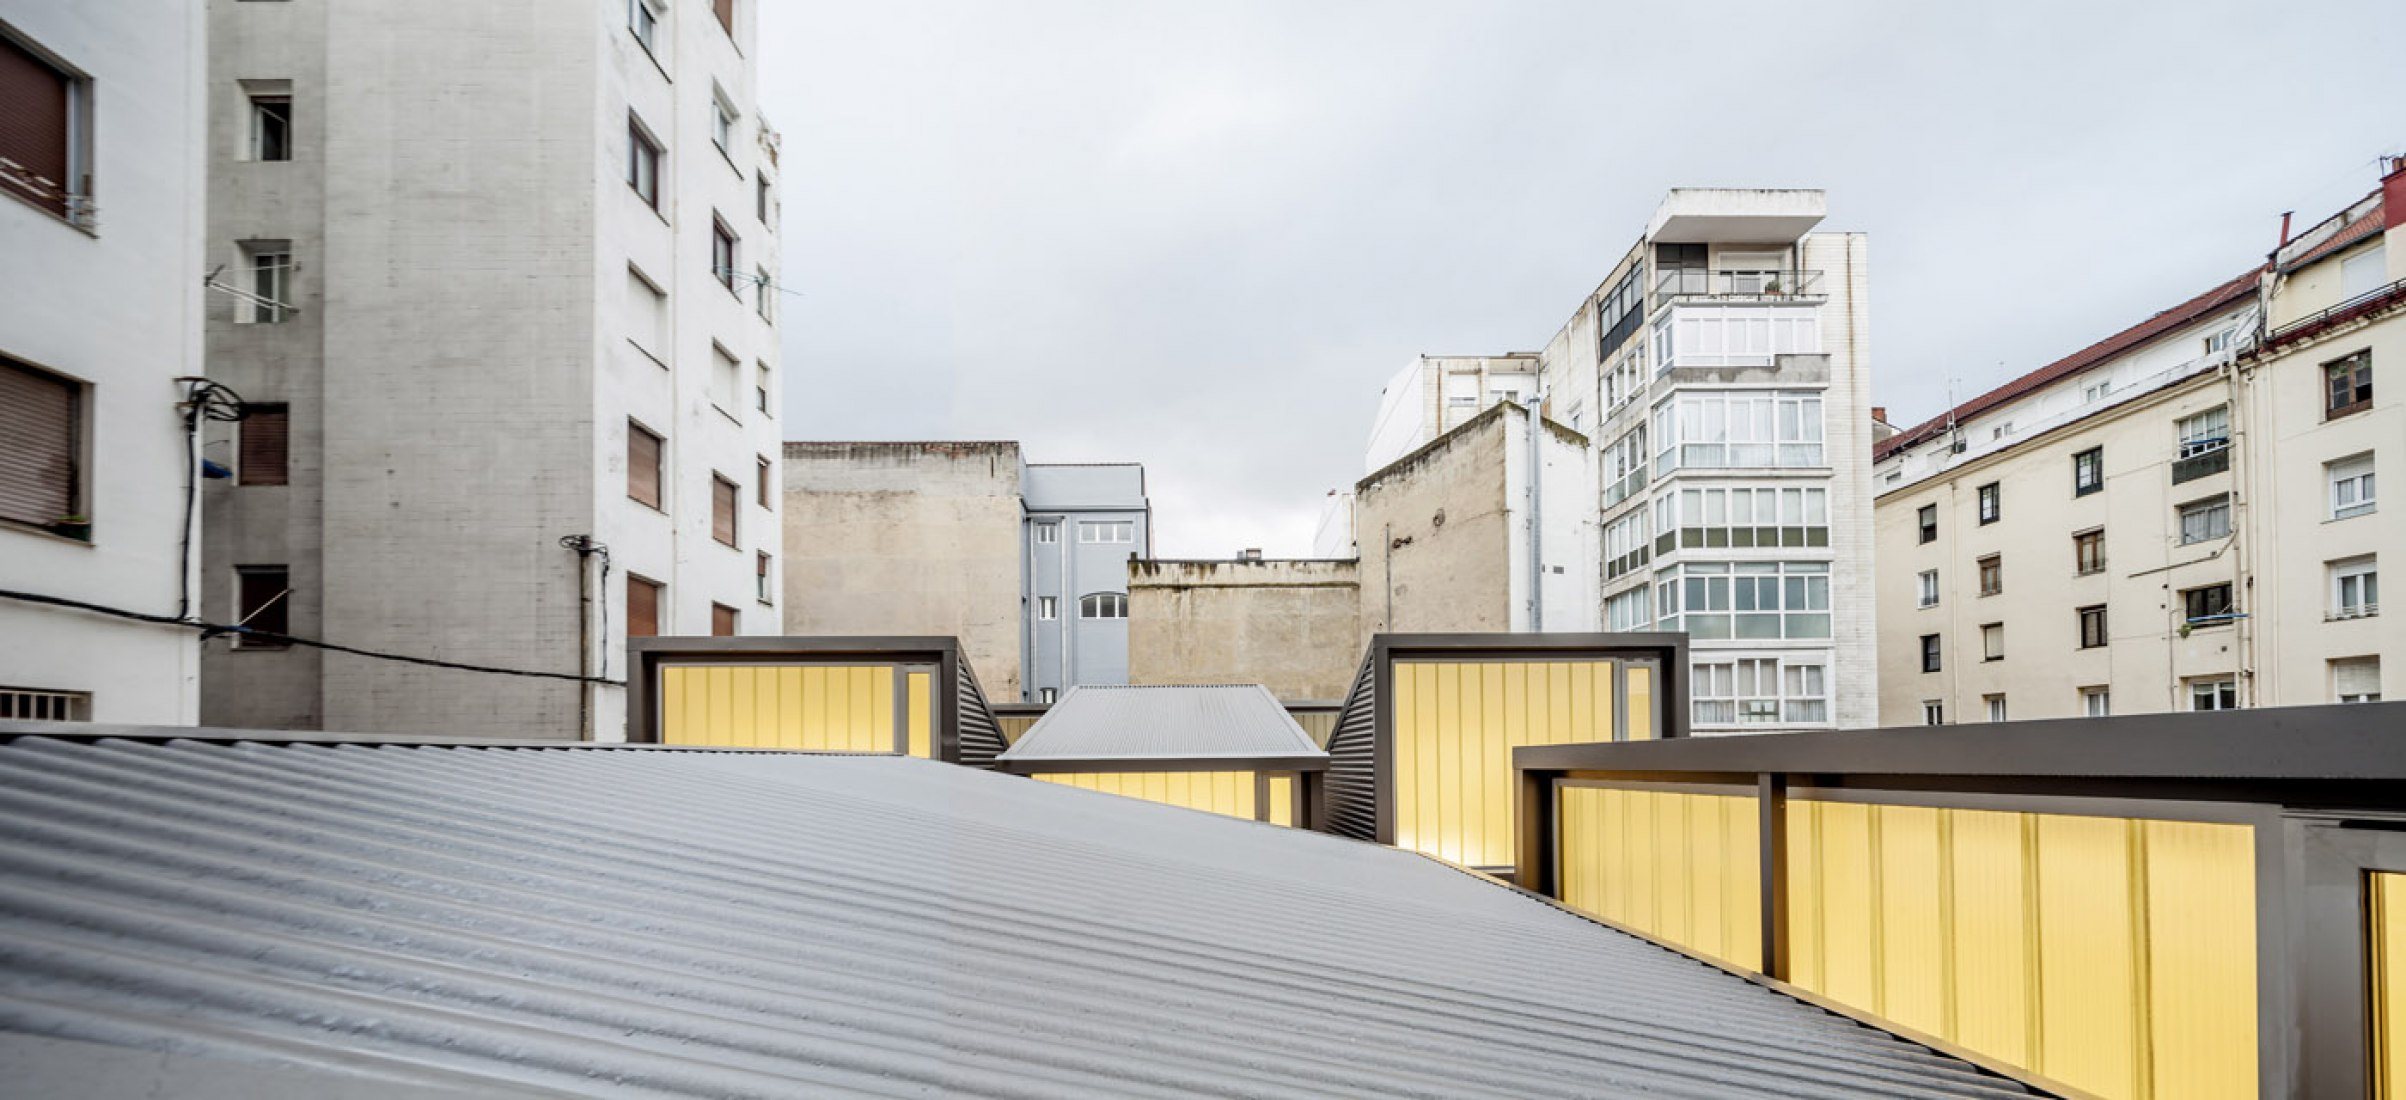 CarrerasMugica Gallery in Bilbao by Estudio Herreros. Photography © Jaime Gartzia